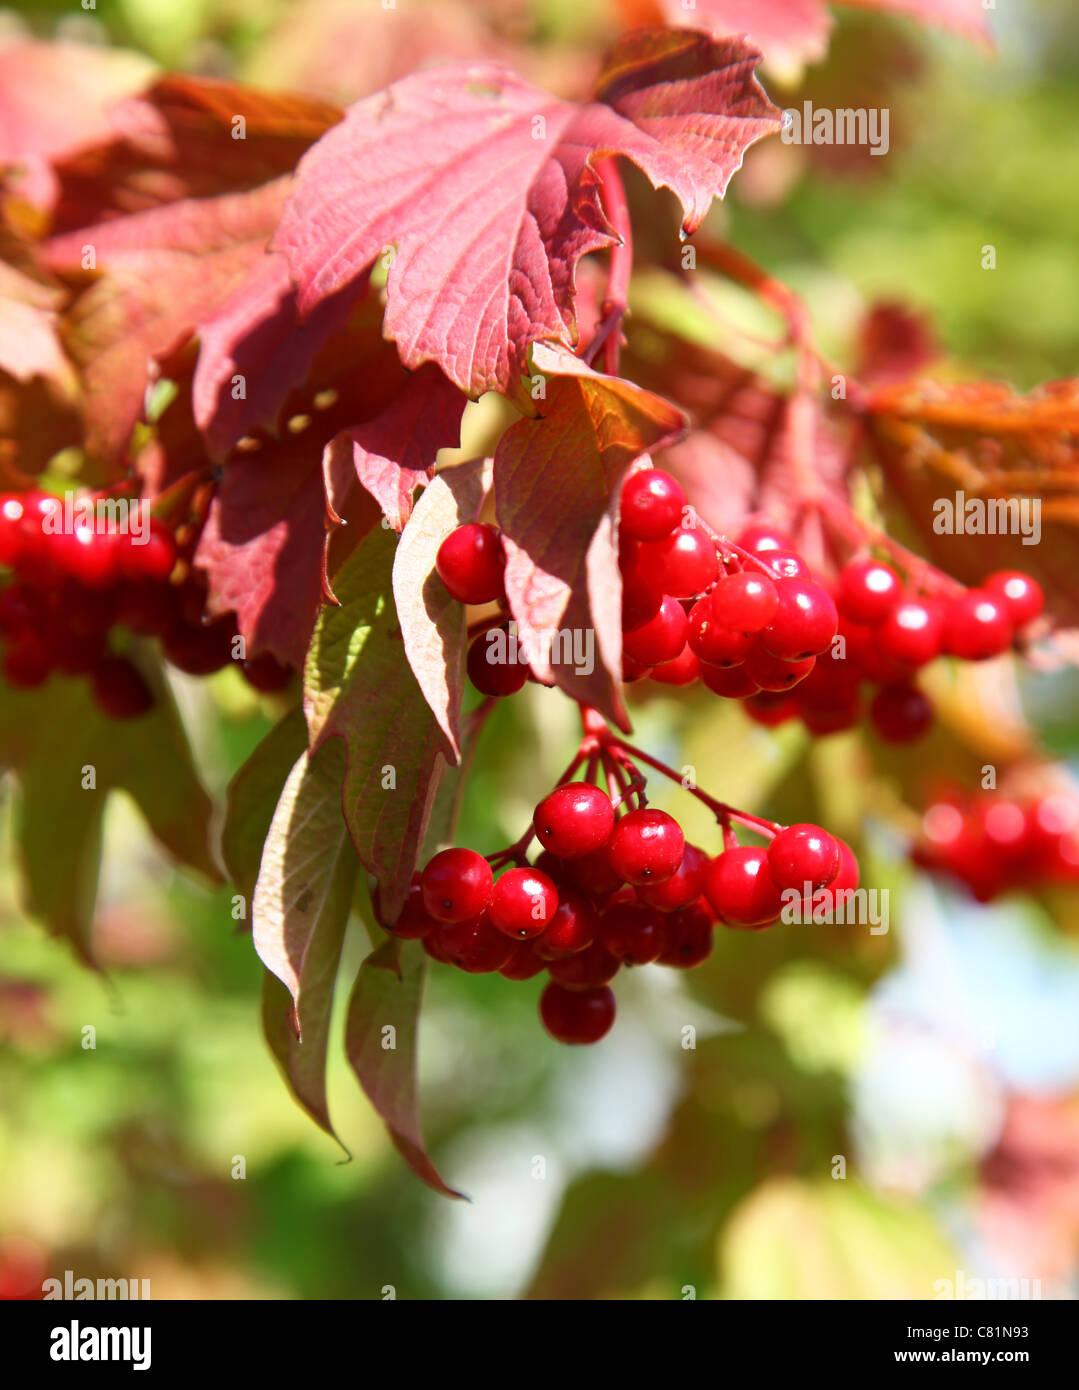 The red berries on a Viburnum bush or tree (Viburnum lantana) - Stock Image